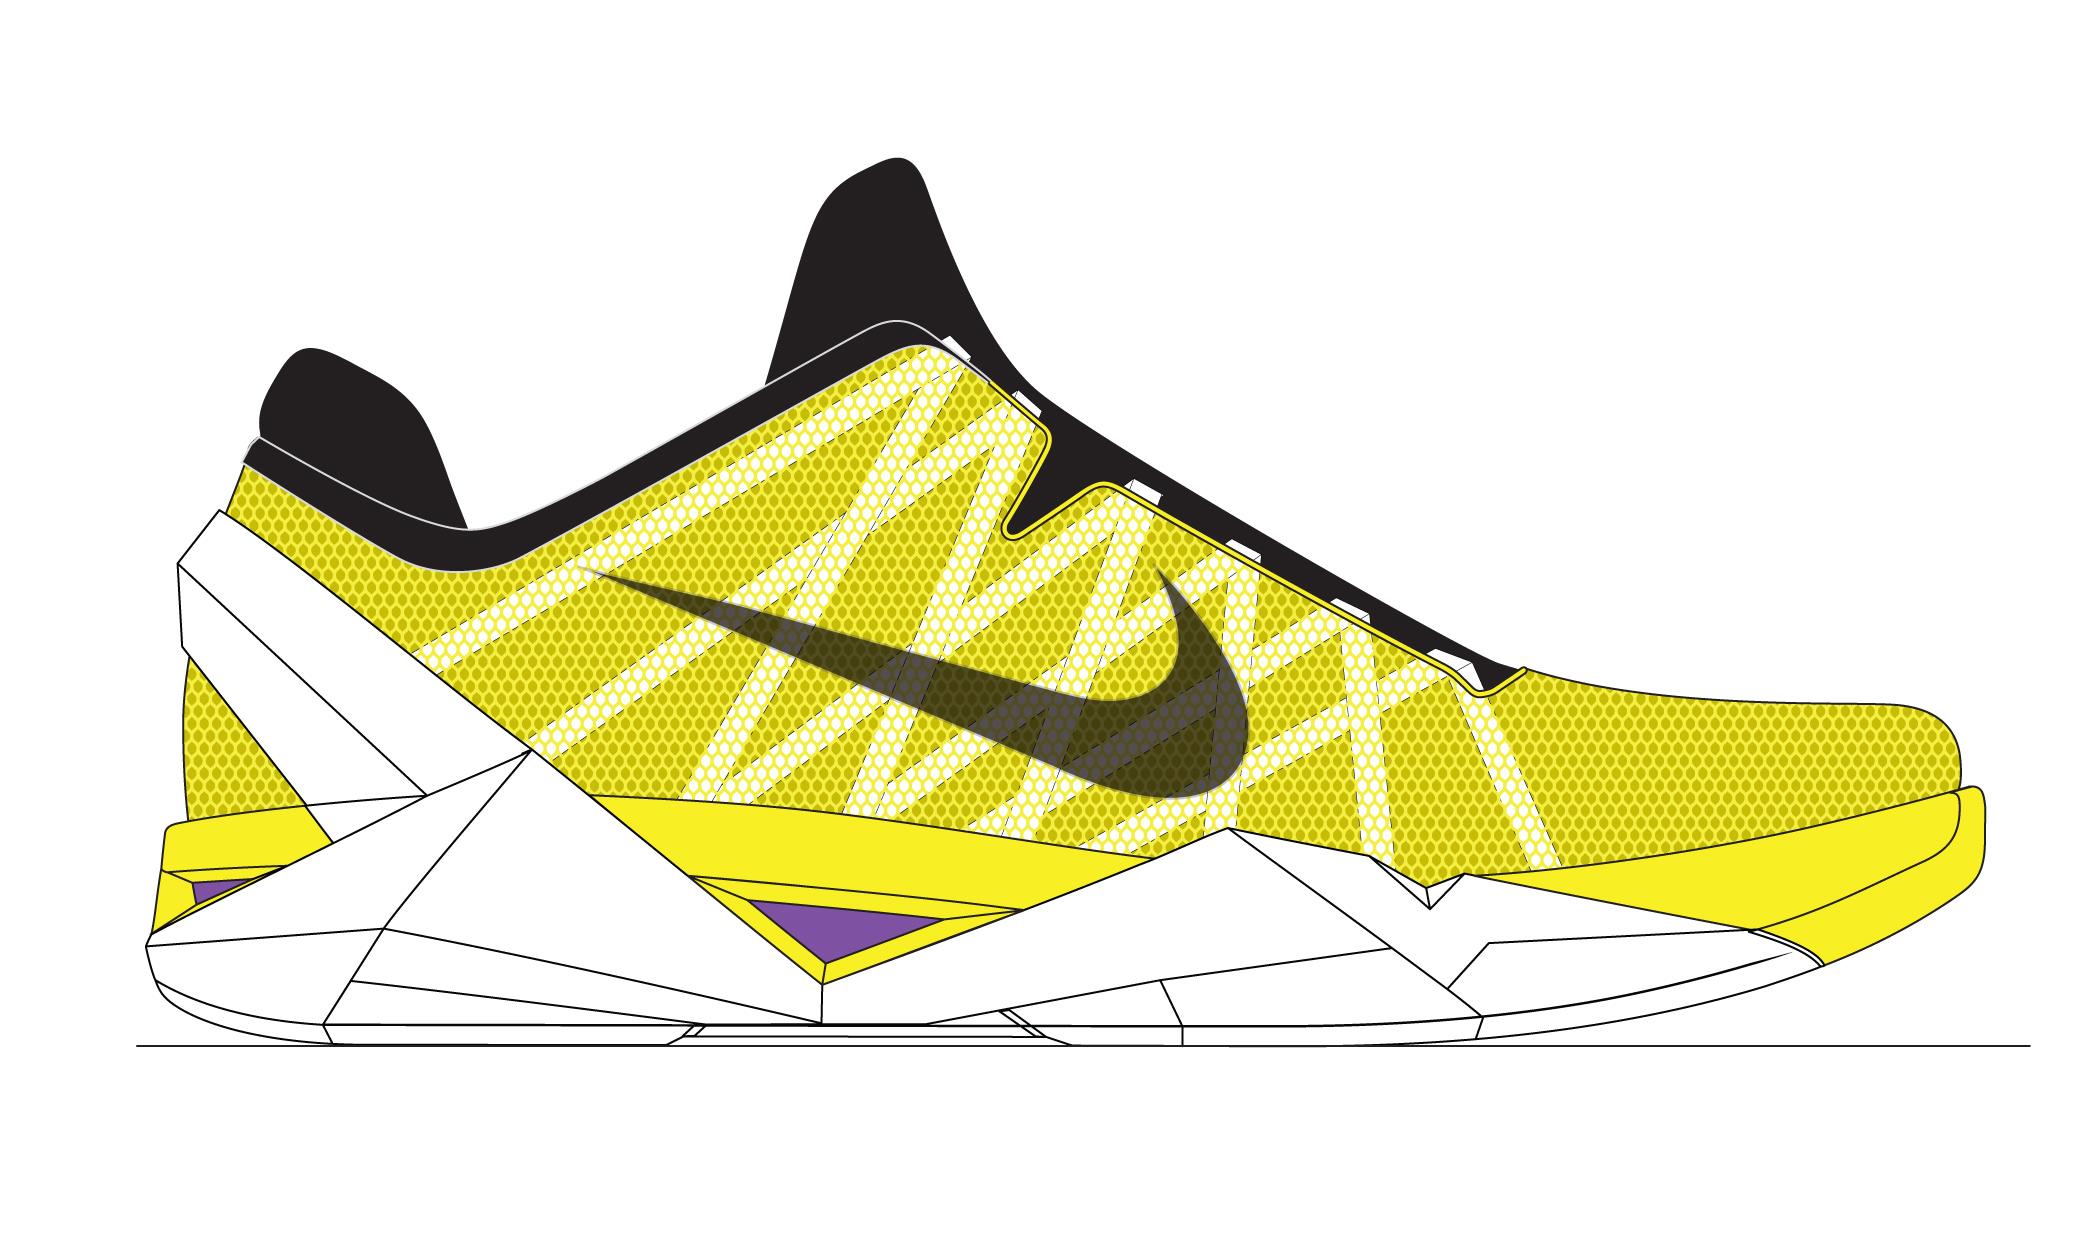 Drawn shoe kobe 9  Building Nike LO and